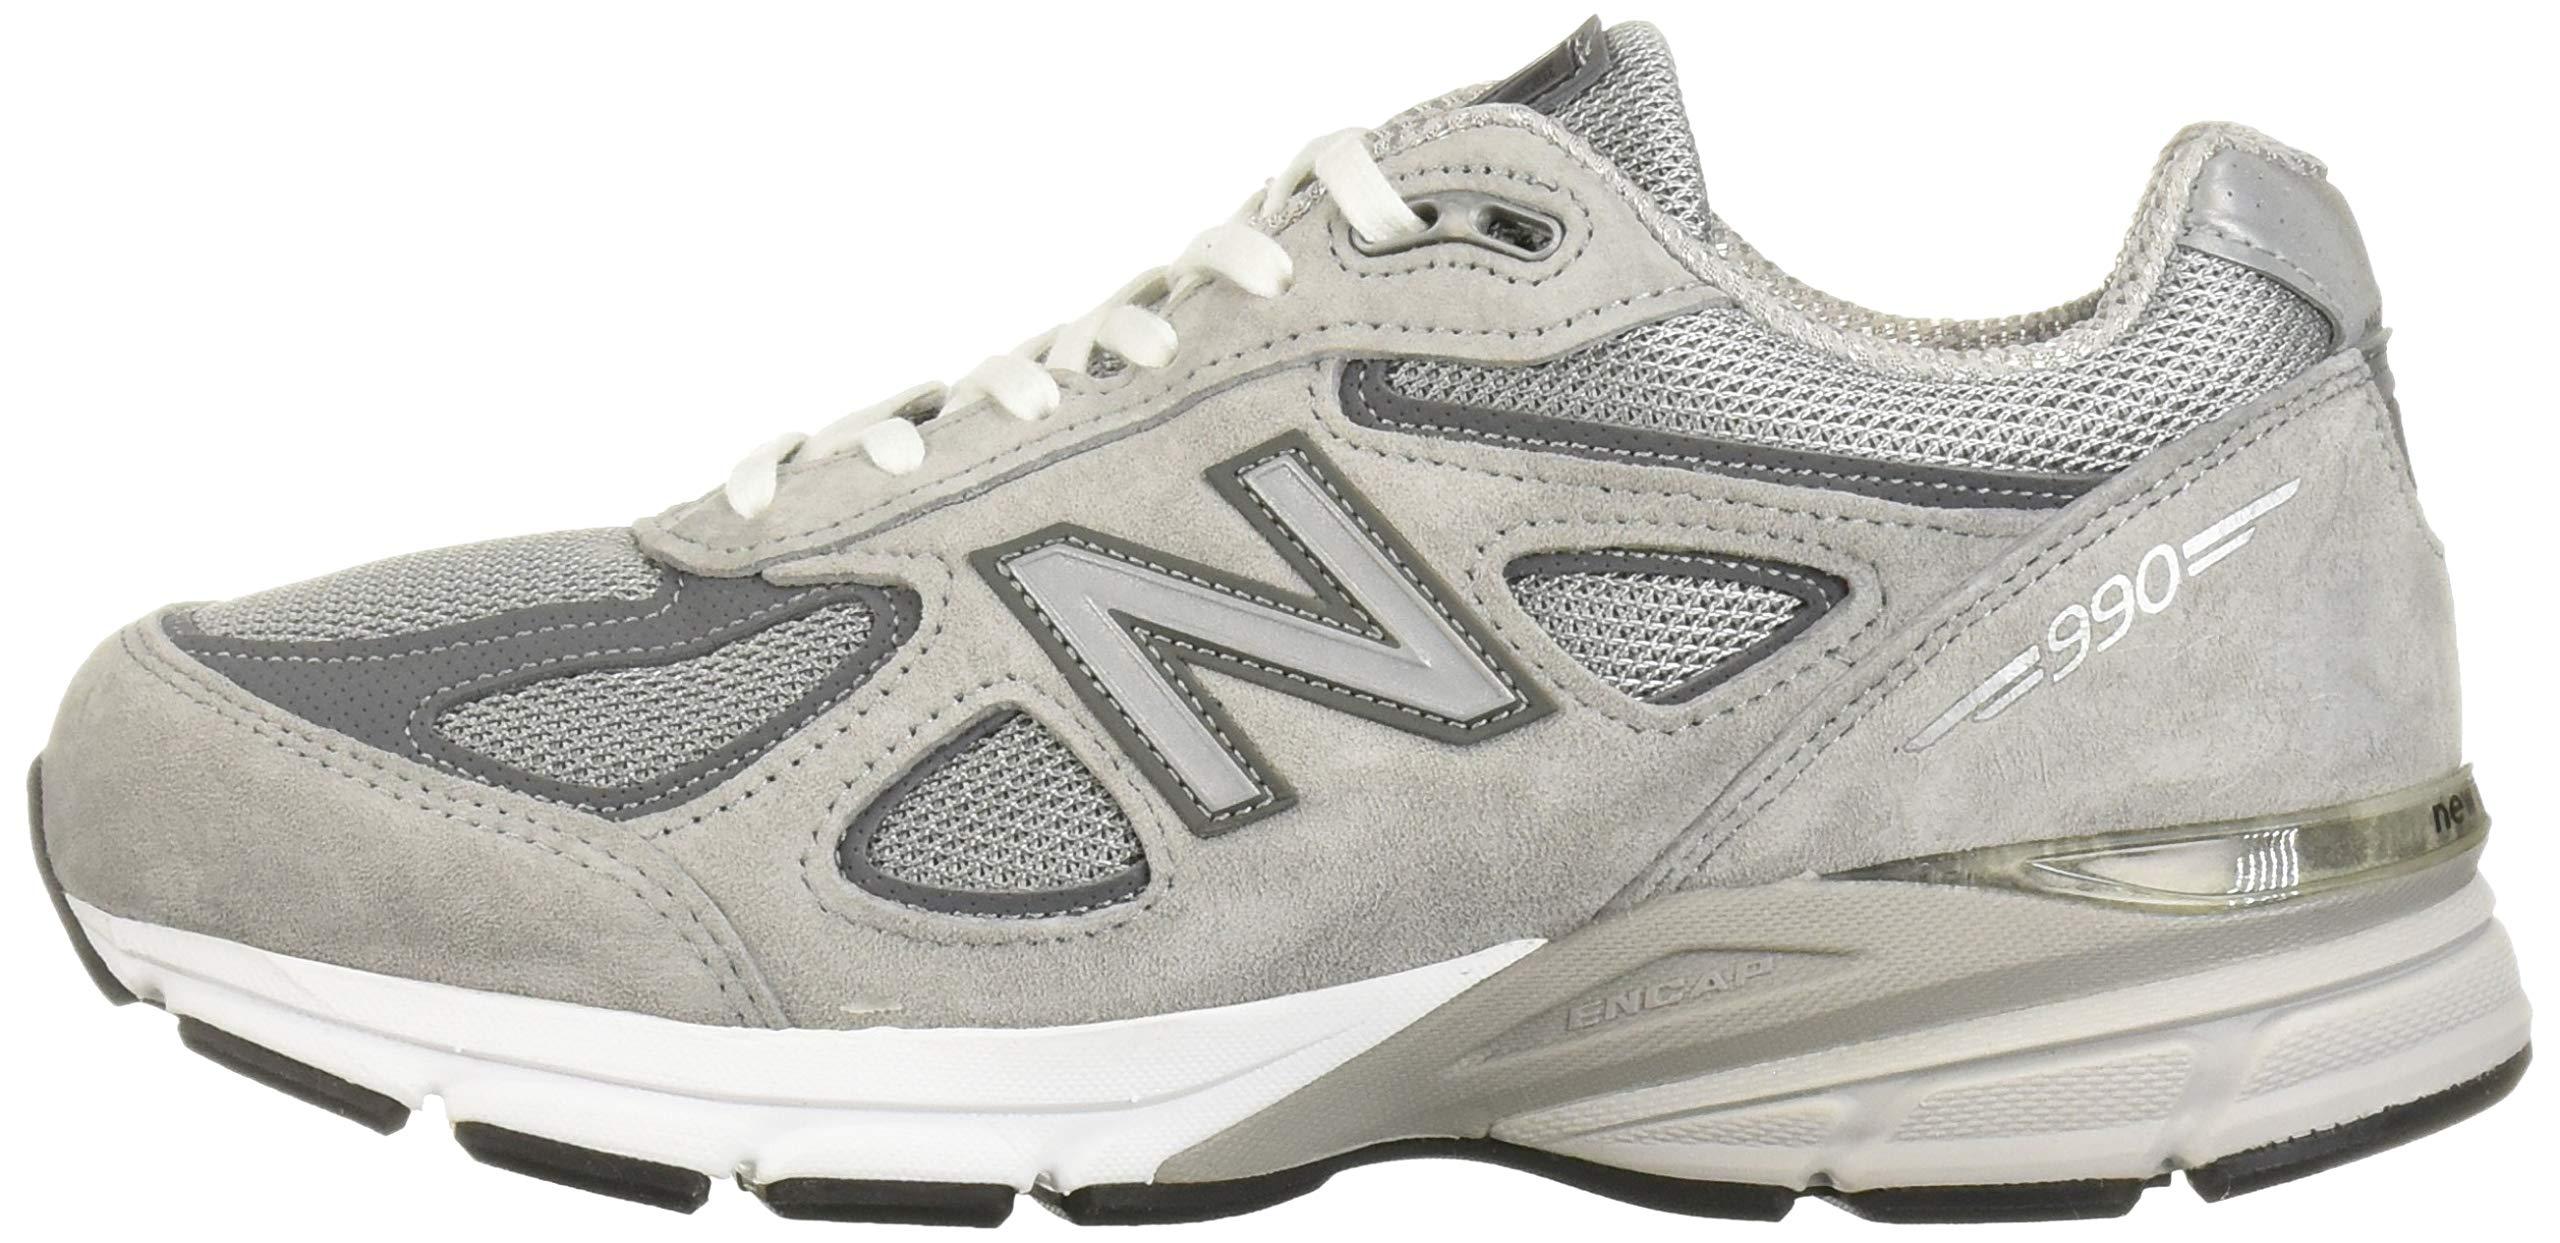 81hR6XwVIbL - New Balance Men's 990v4 Running Shoe